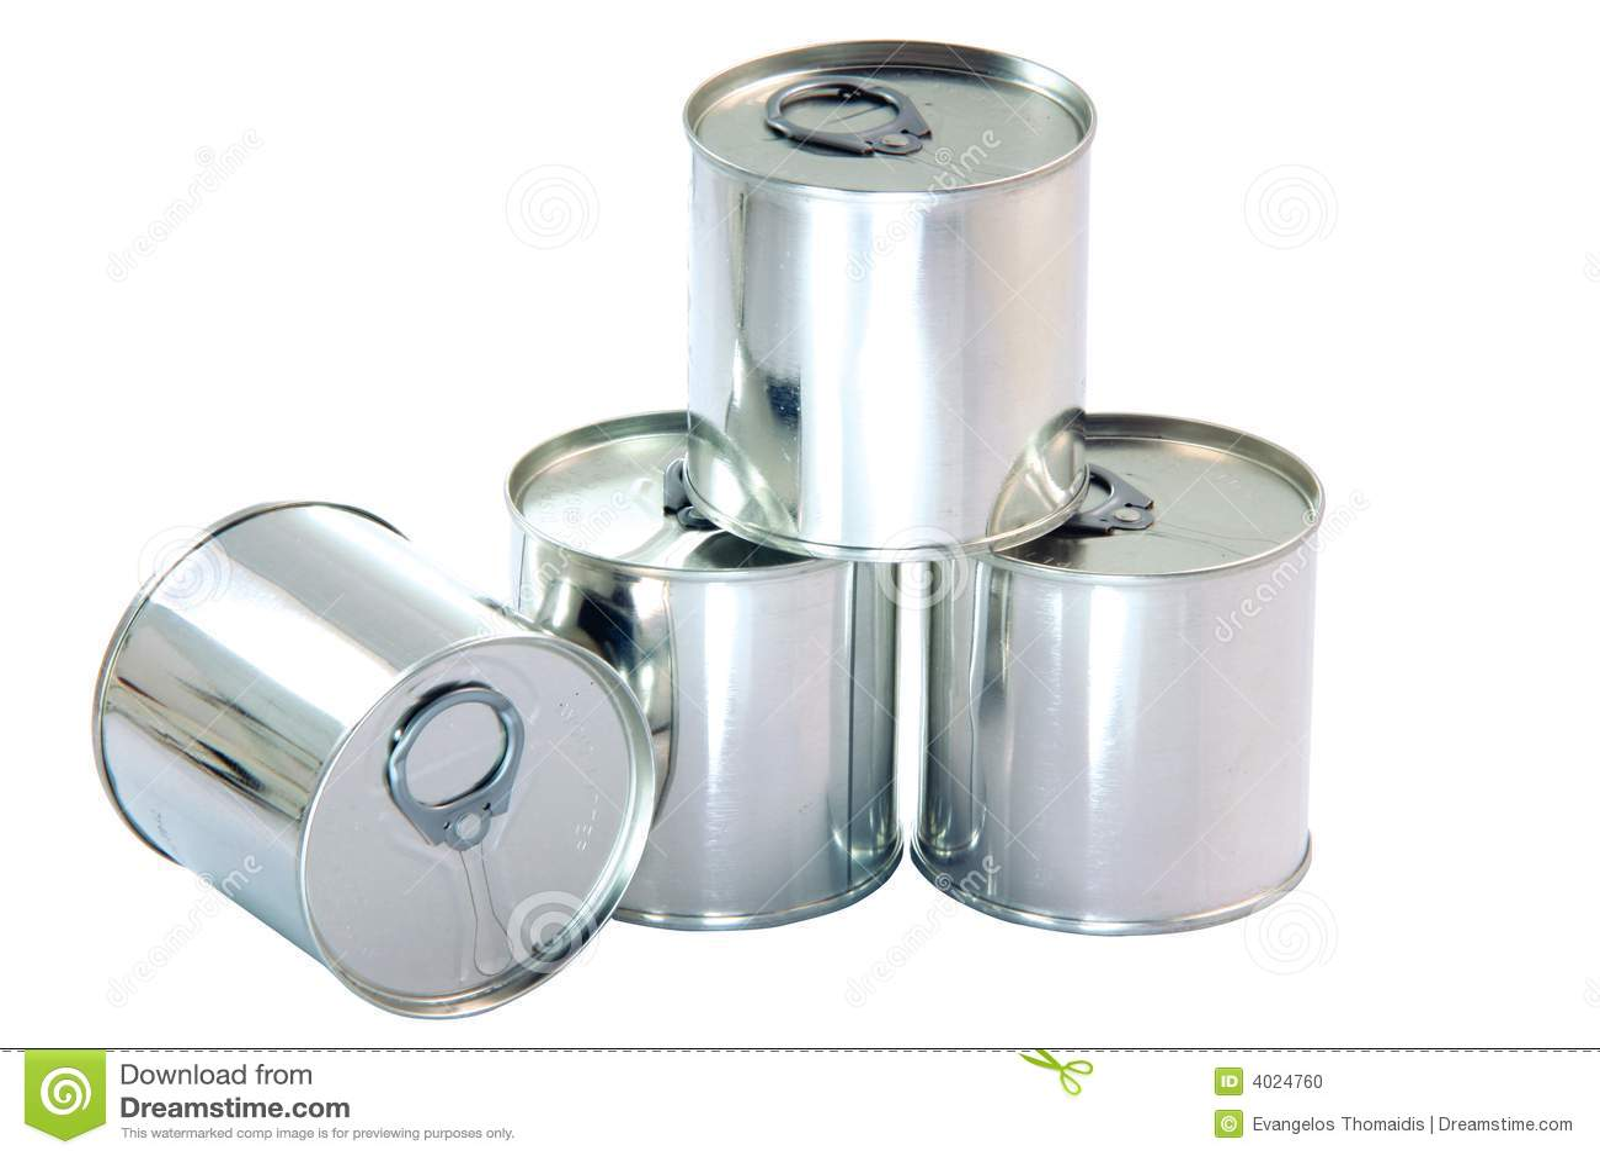 Aluminium Cans Stock Photo - Image: 4024760